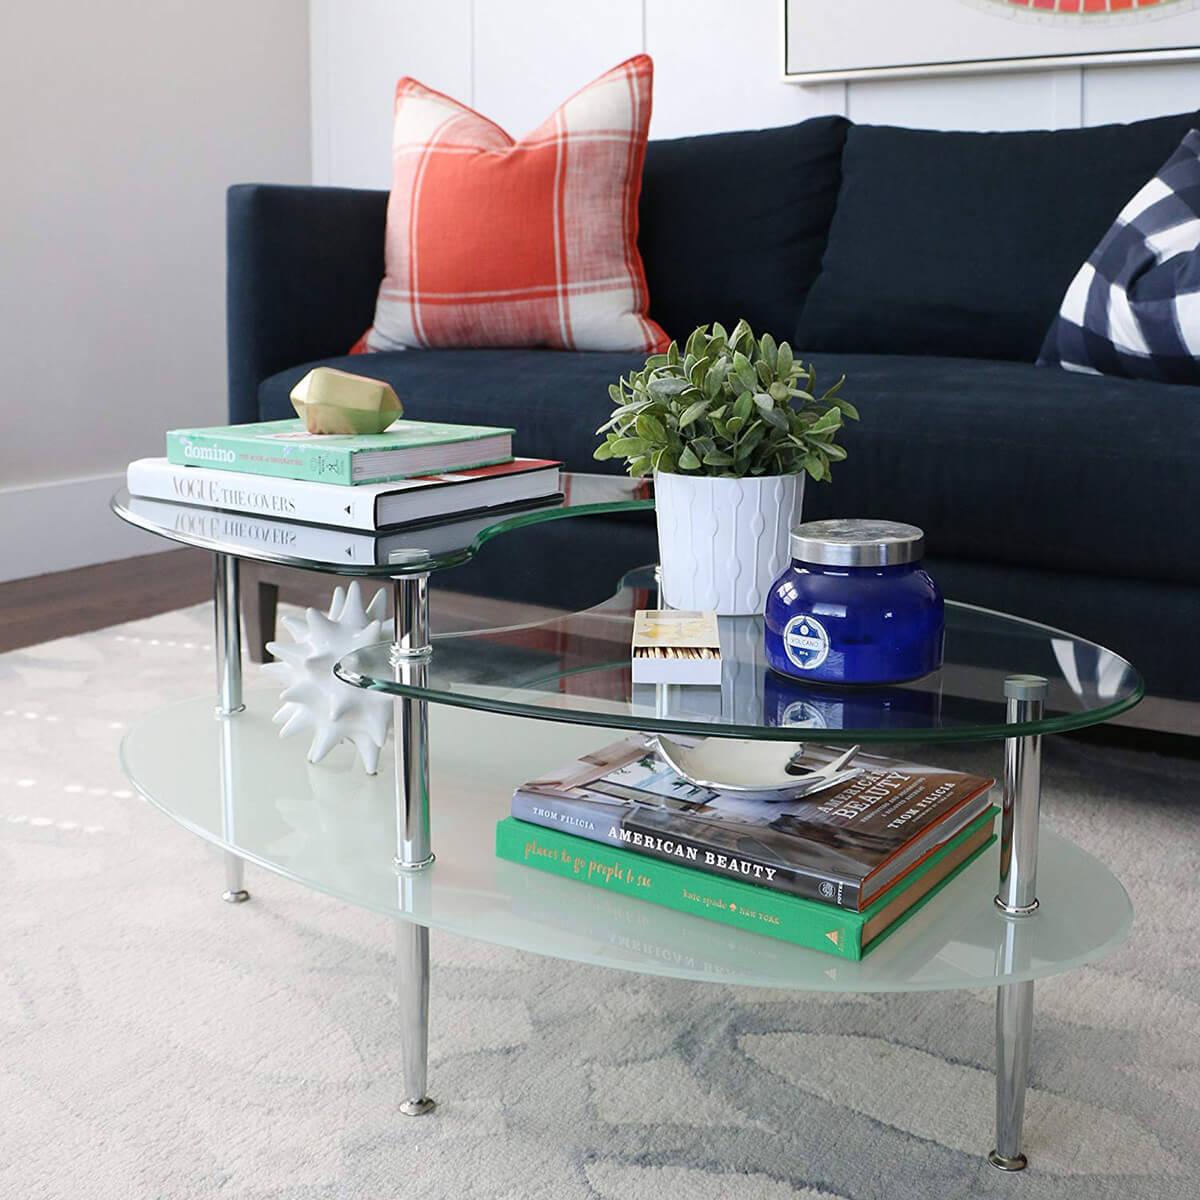 Futuristic Glass and Oval Shaped Table